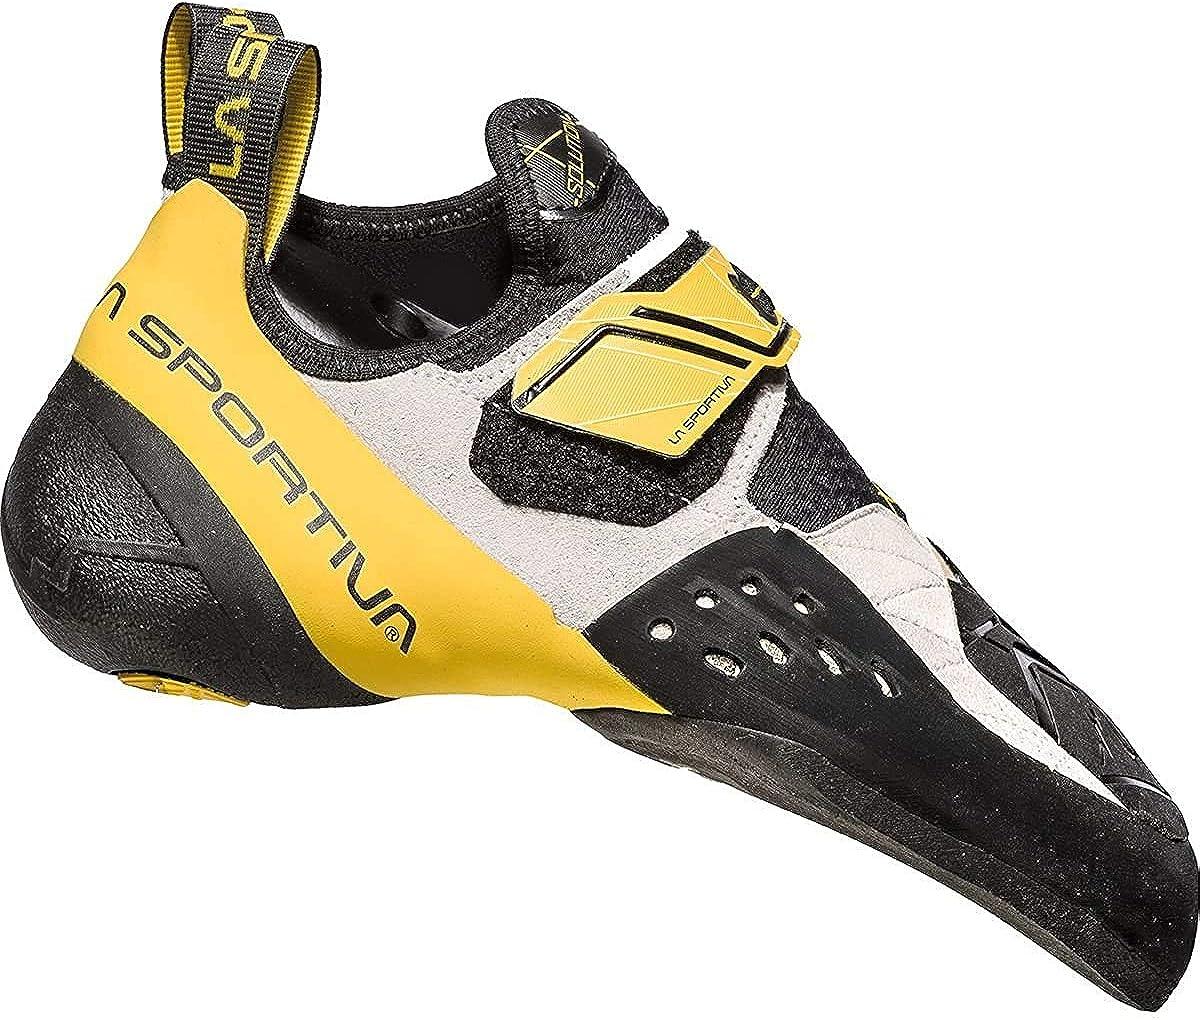 LA SPORTIVA Solution White/Yellow, Zapatillas de Escalada, 37.5 EU